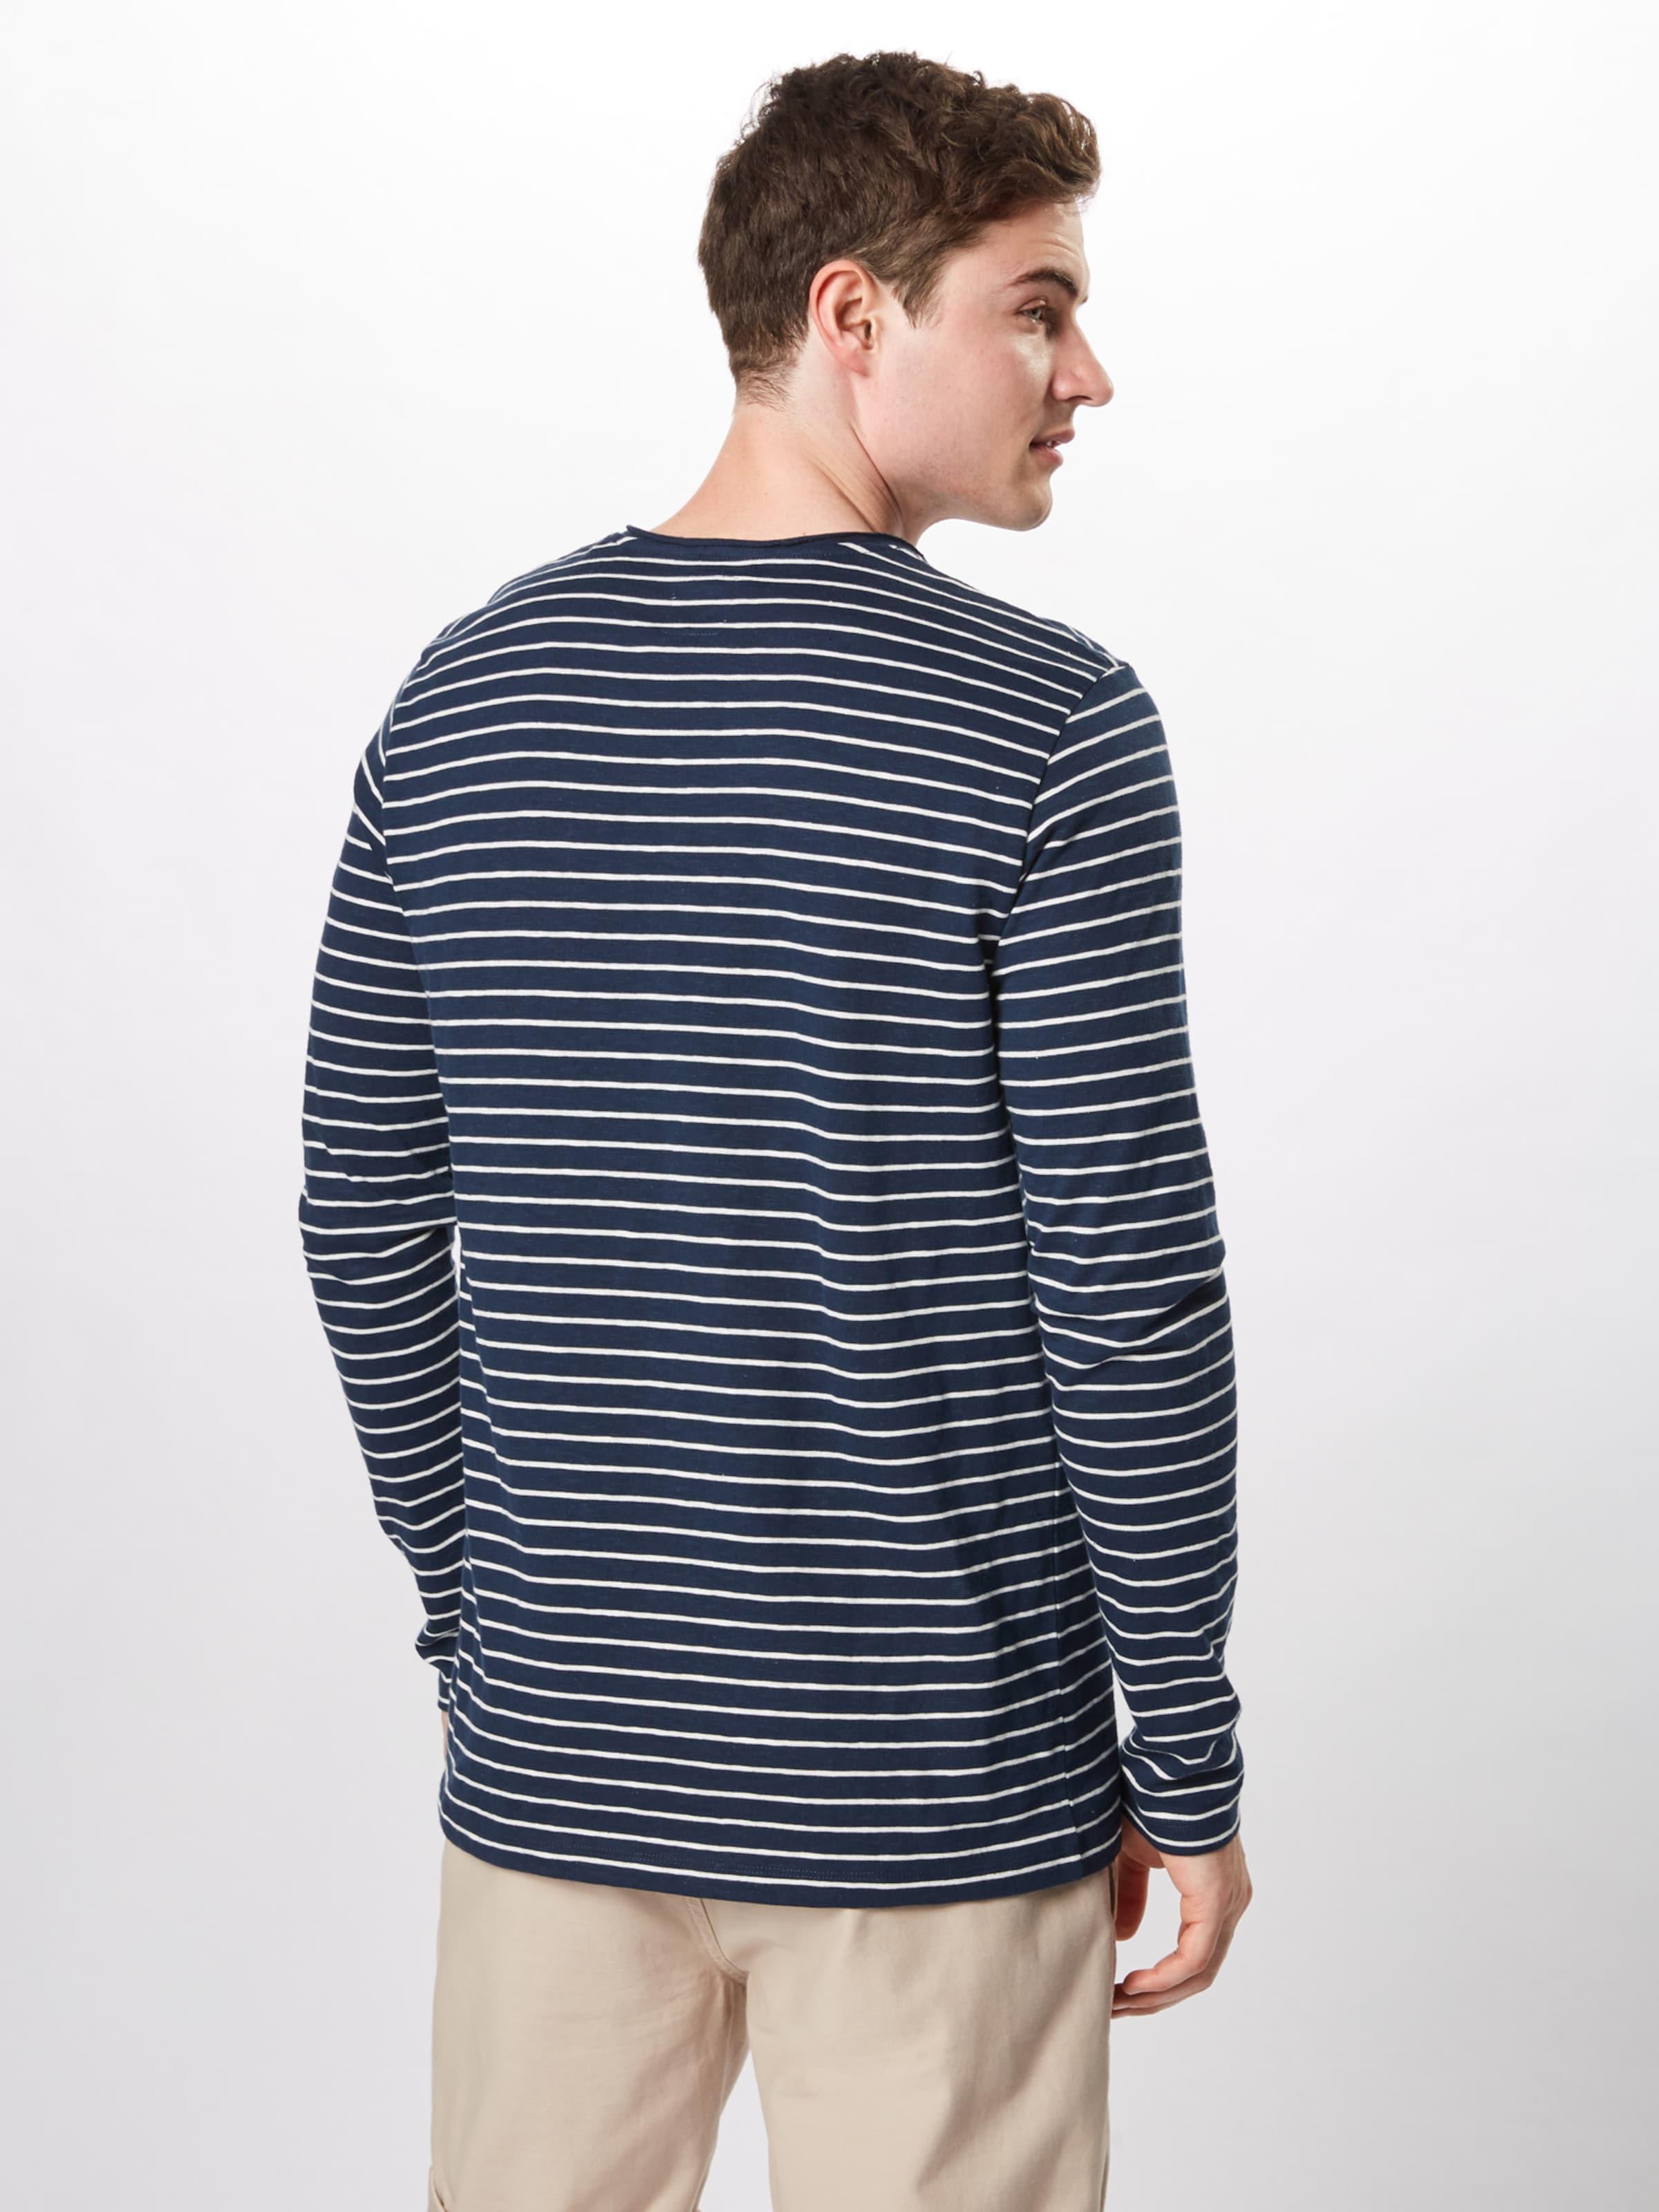 By En shirt Marine Esprit T Bleu Edc wkZiXuPlOT